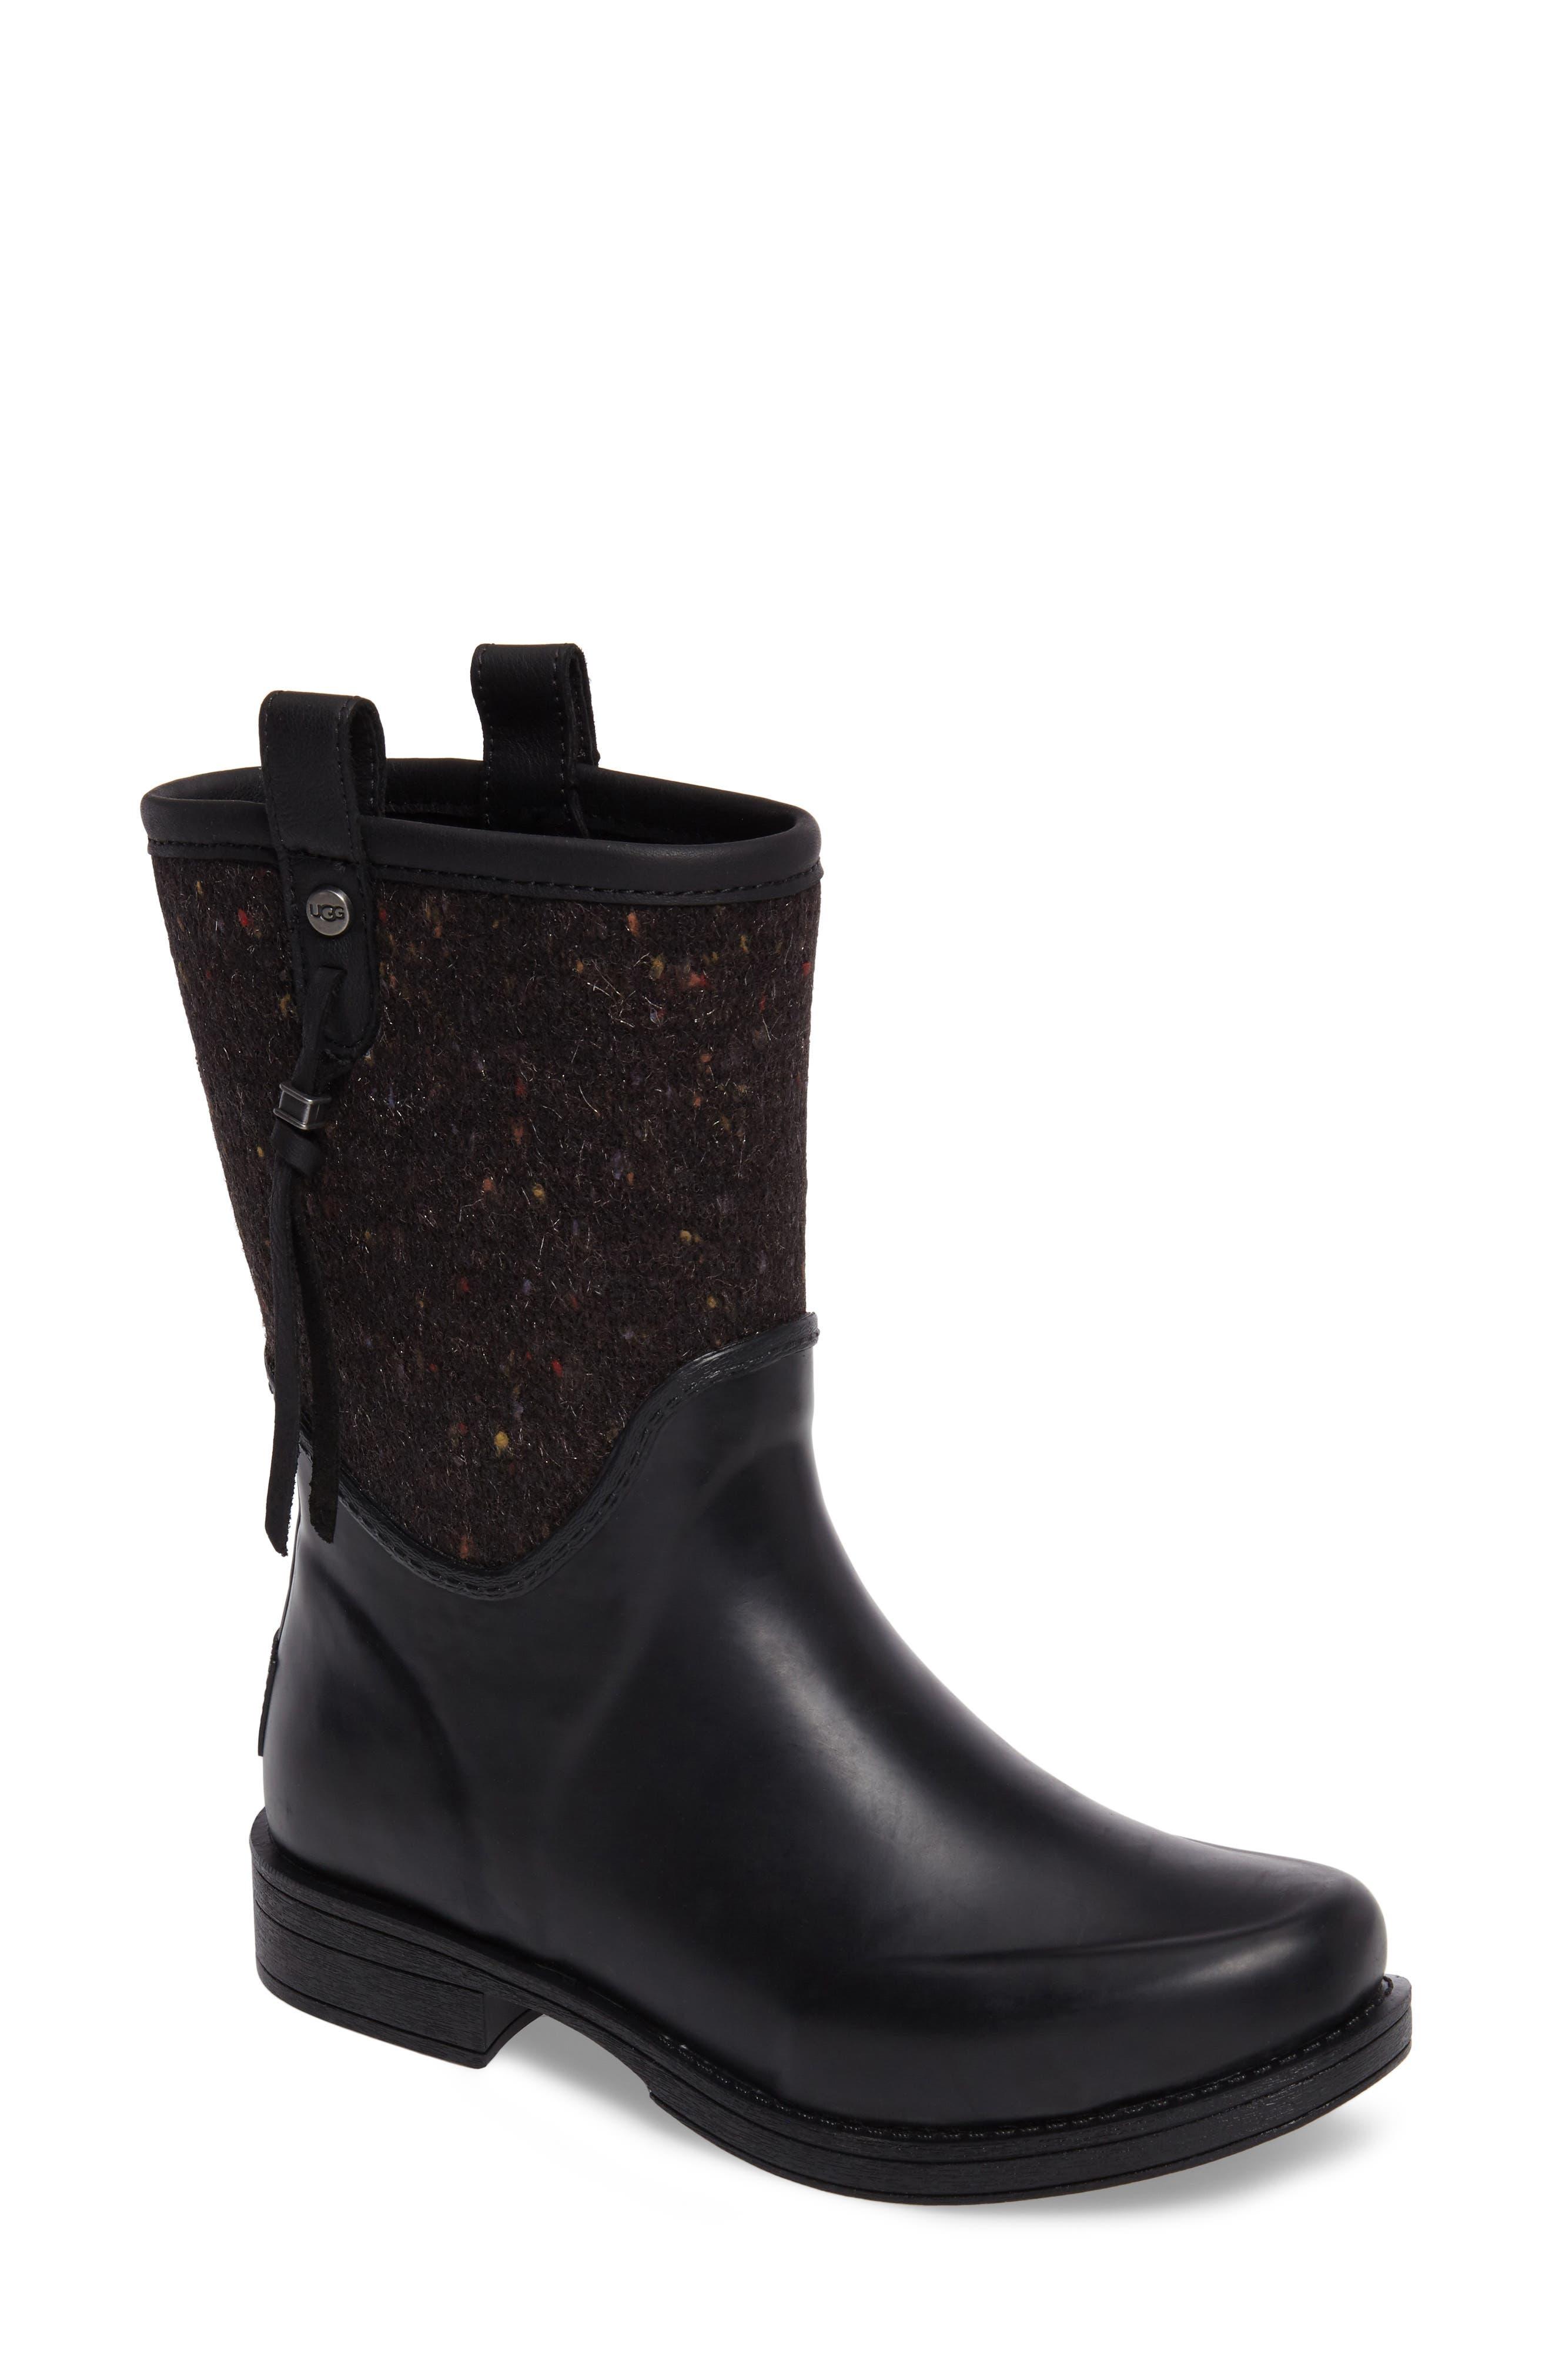 ugg boots for nordstrom